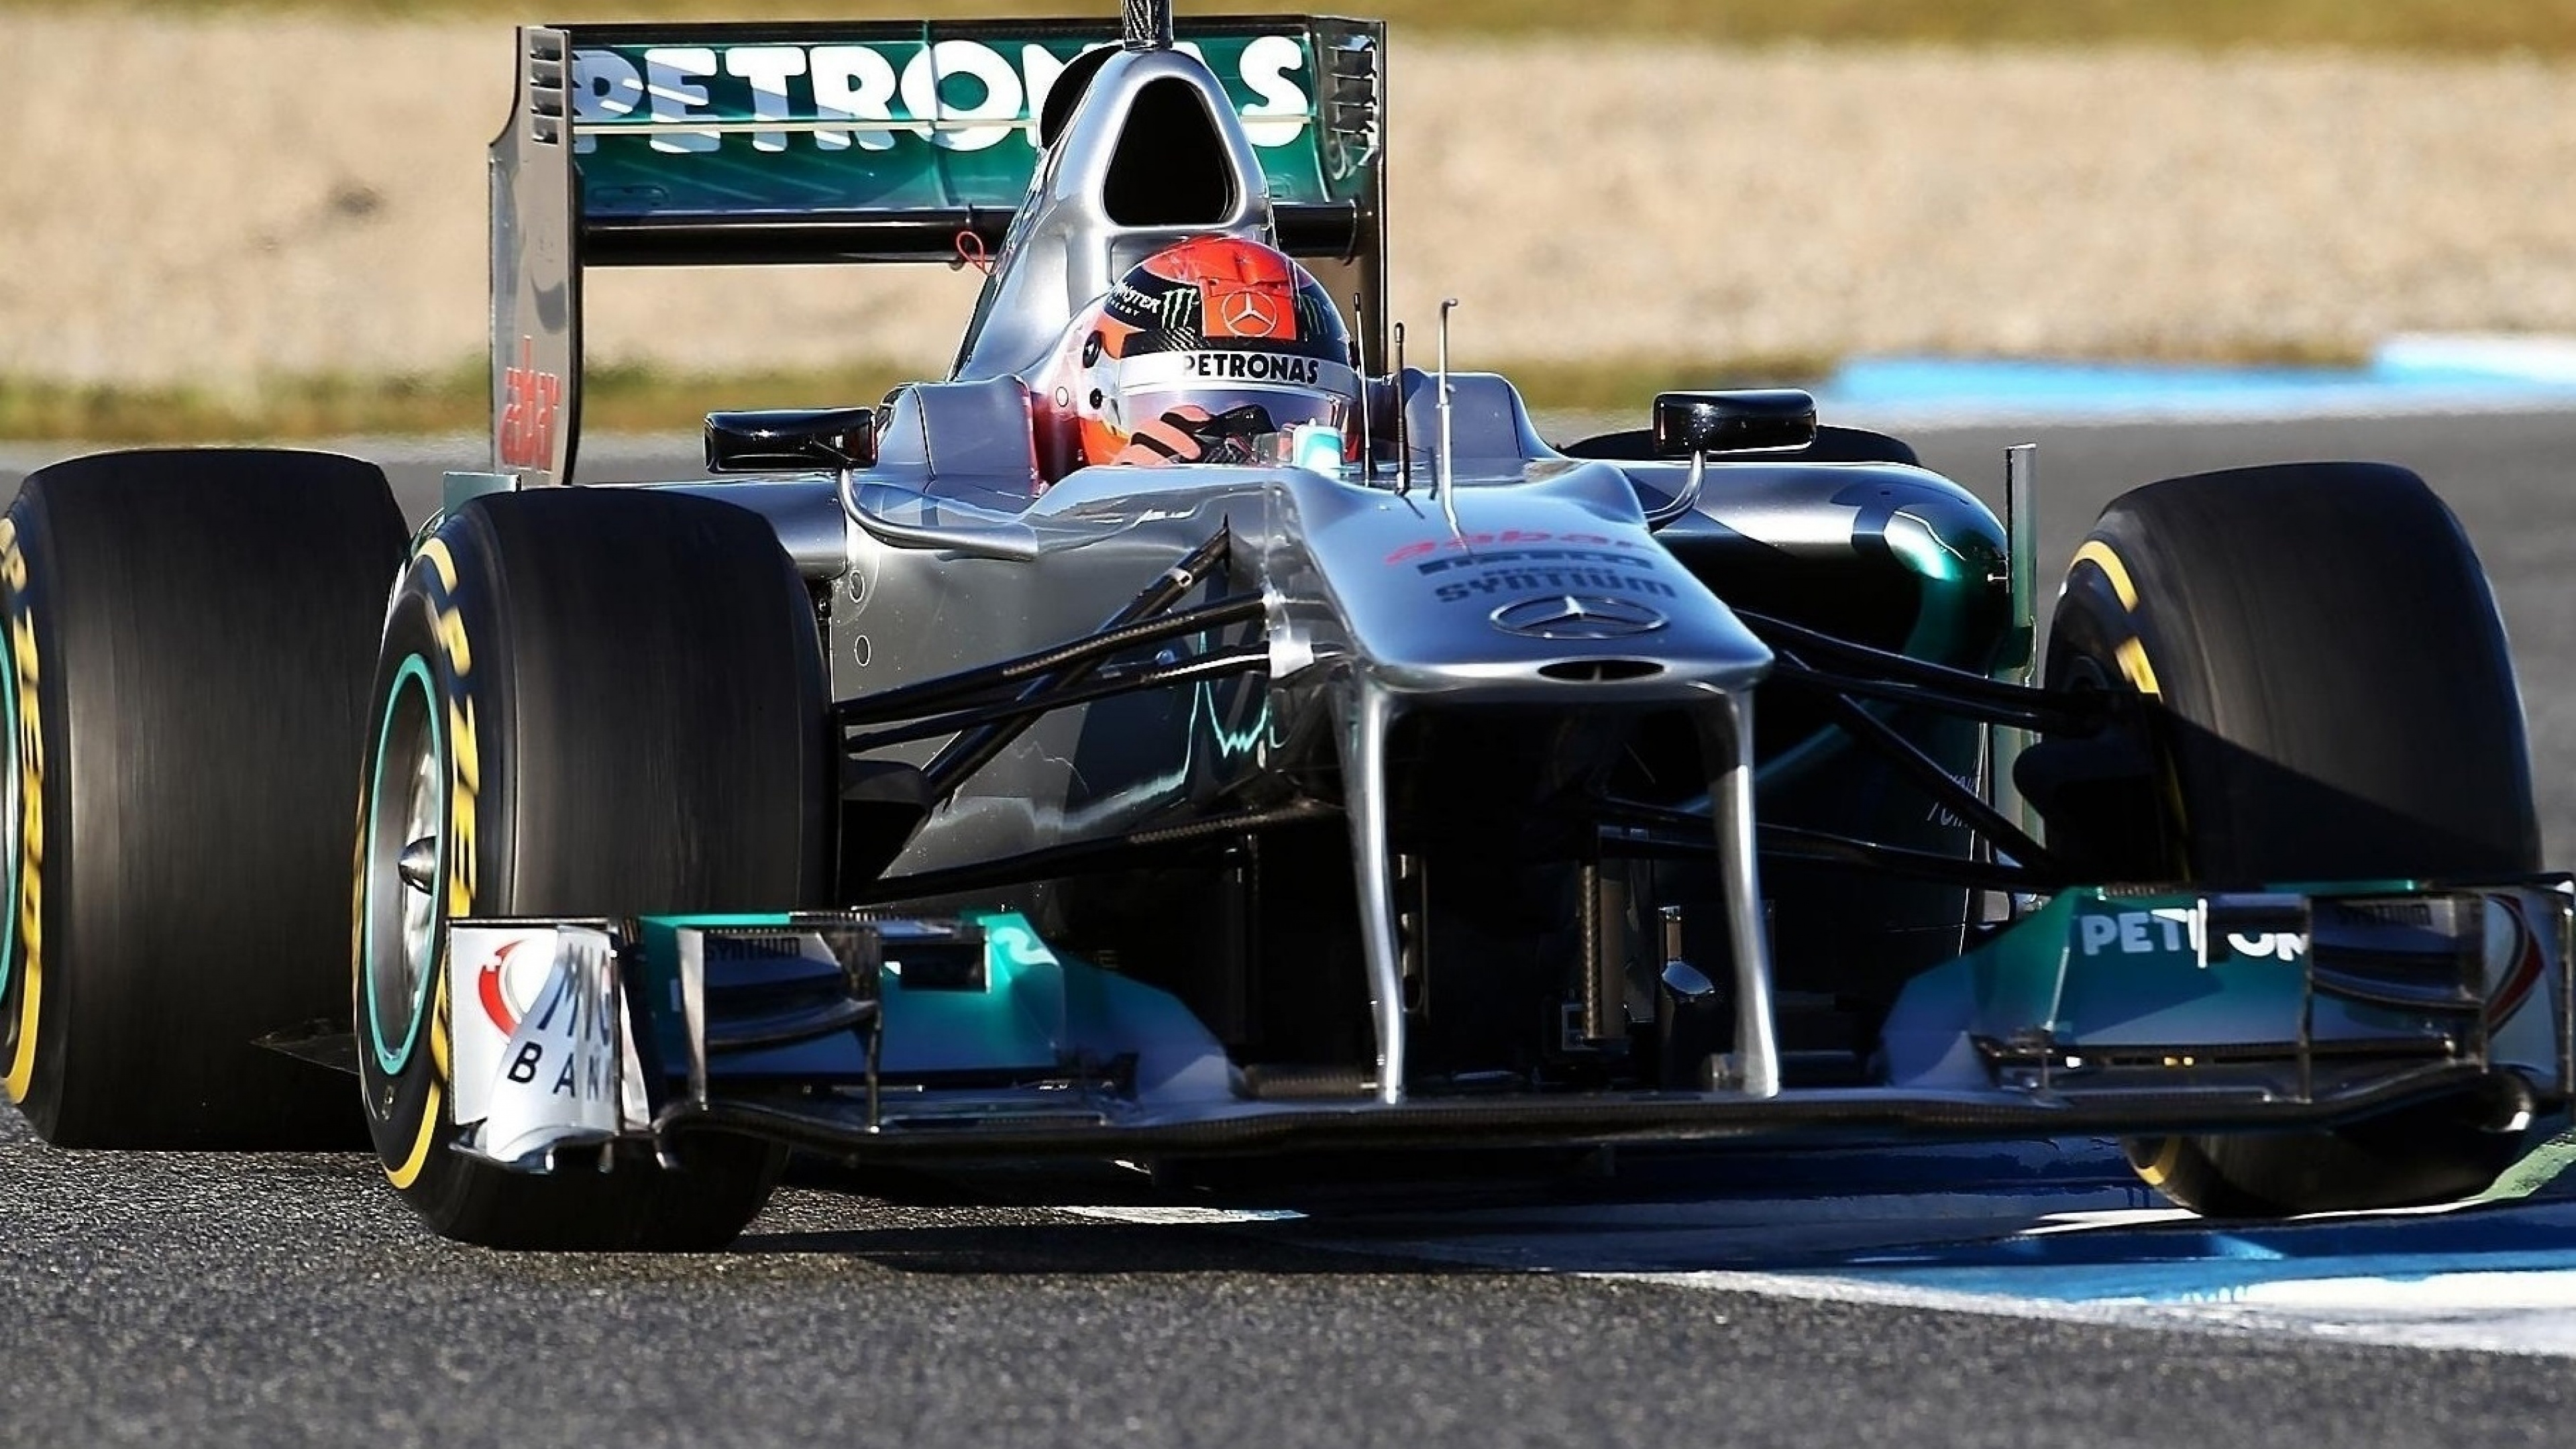 Download Wallpaper 3840x2160 Schumacher Mercedes F1 4K Ultra HD HD 3840x2160